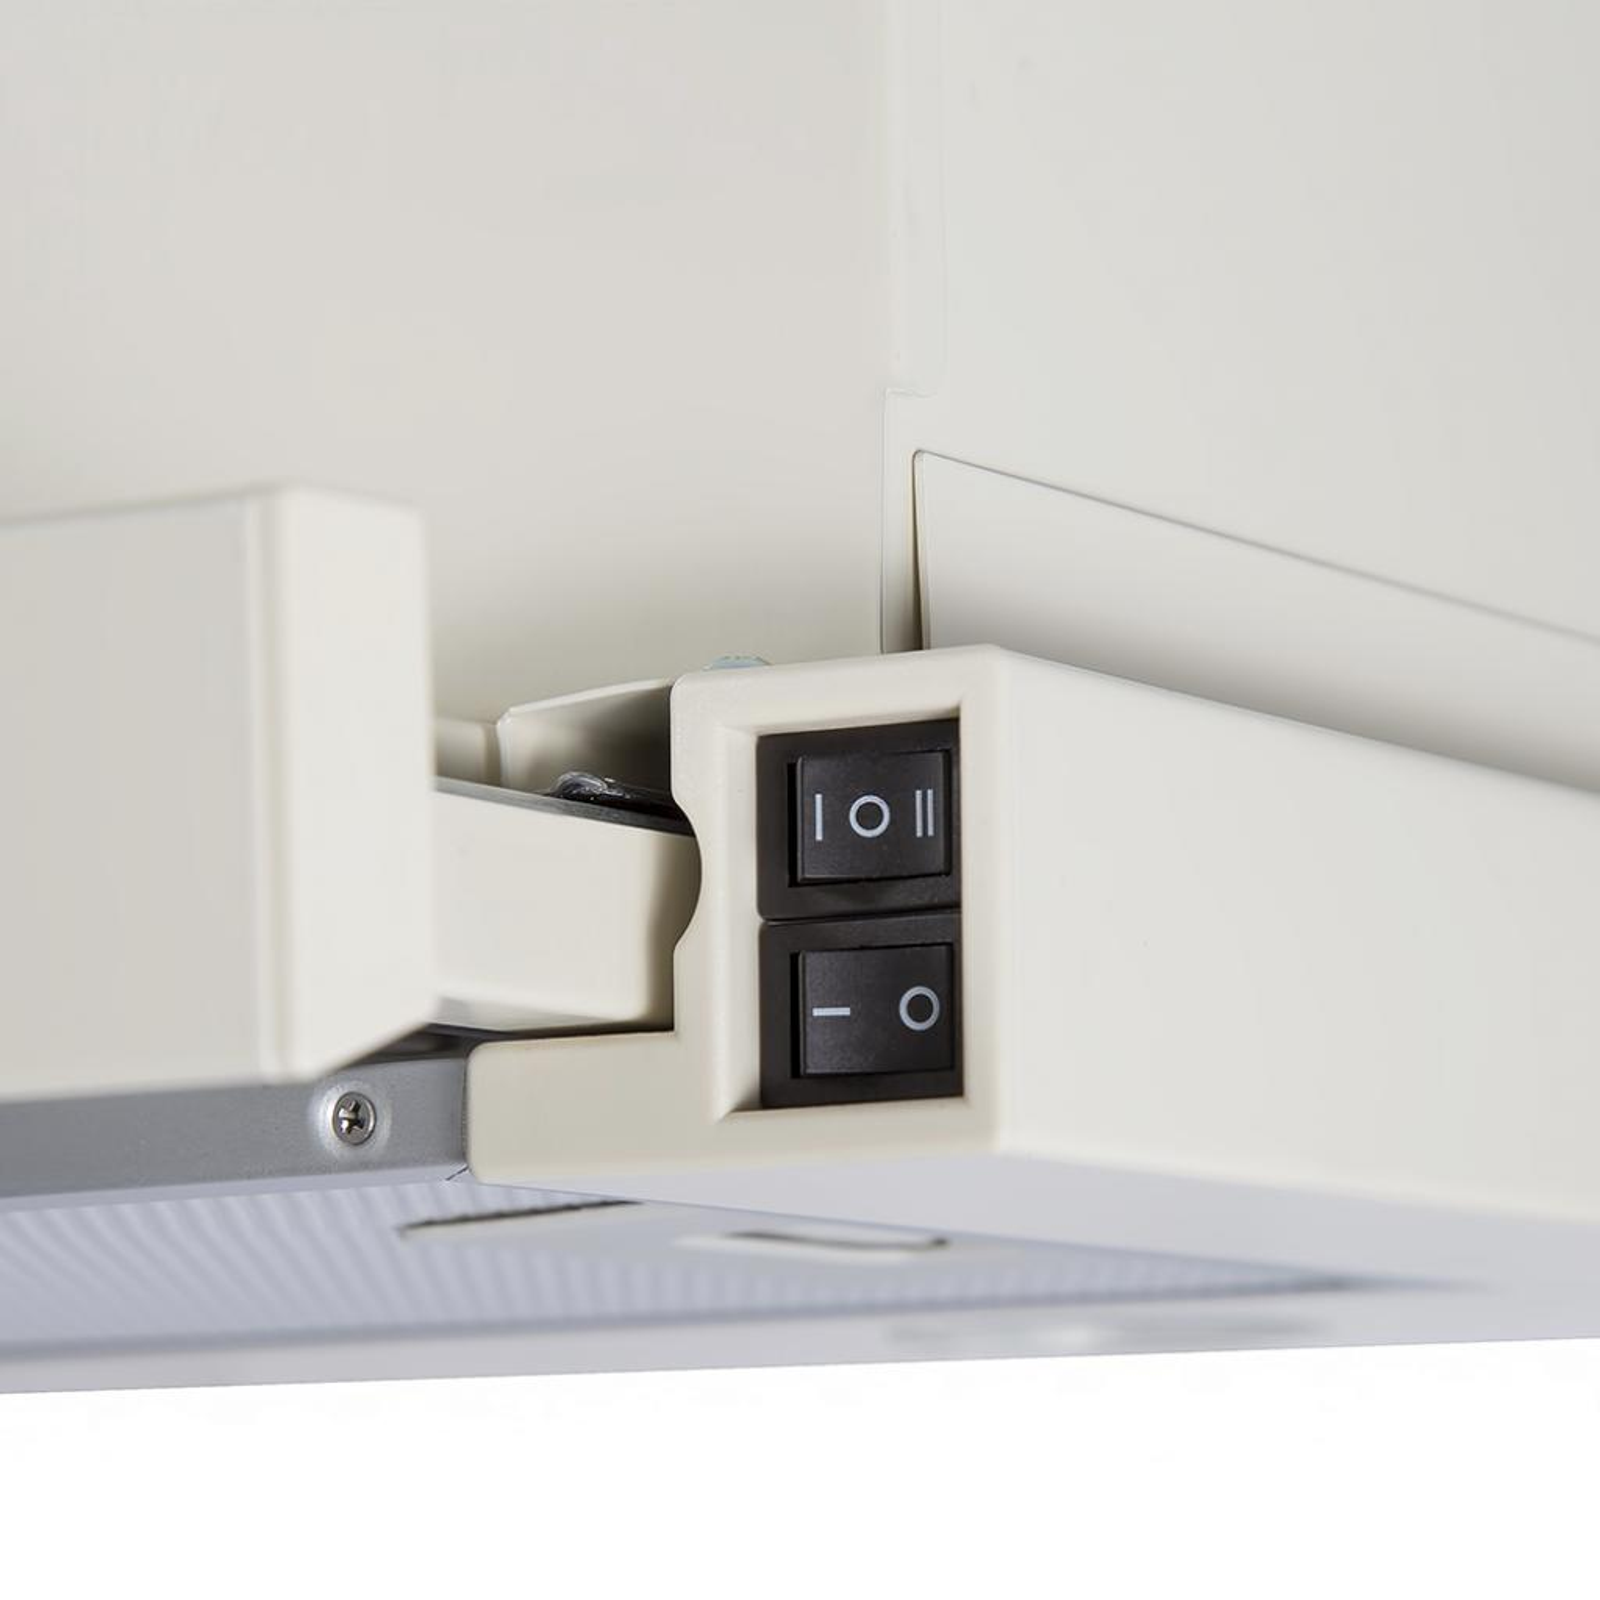 Вытяжка кухонная PERFELLI TL 5103 IV LED изображение 3